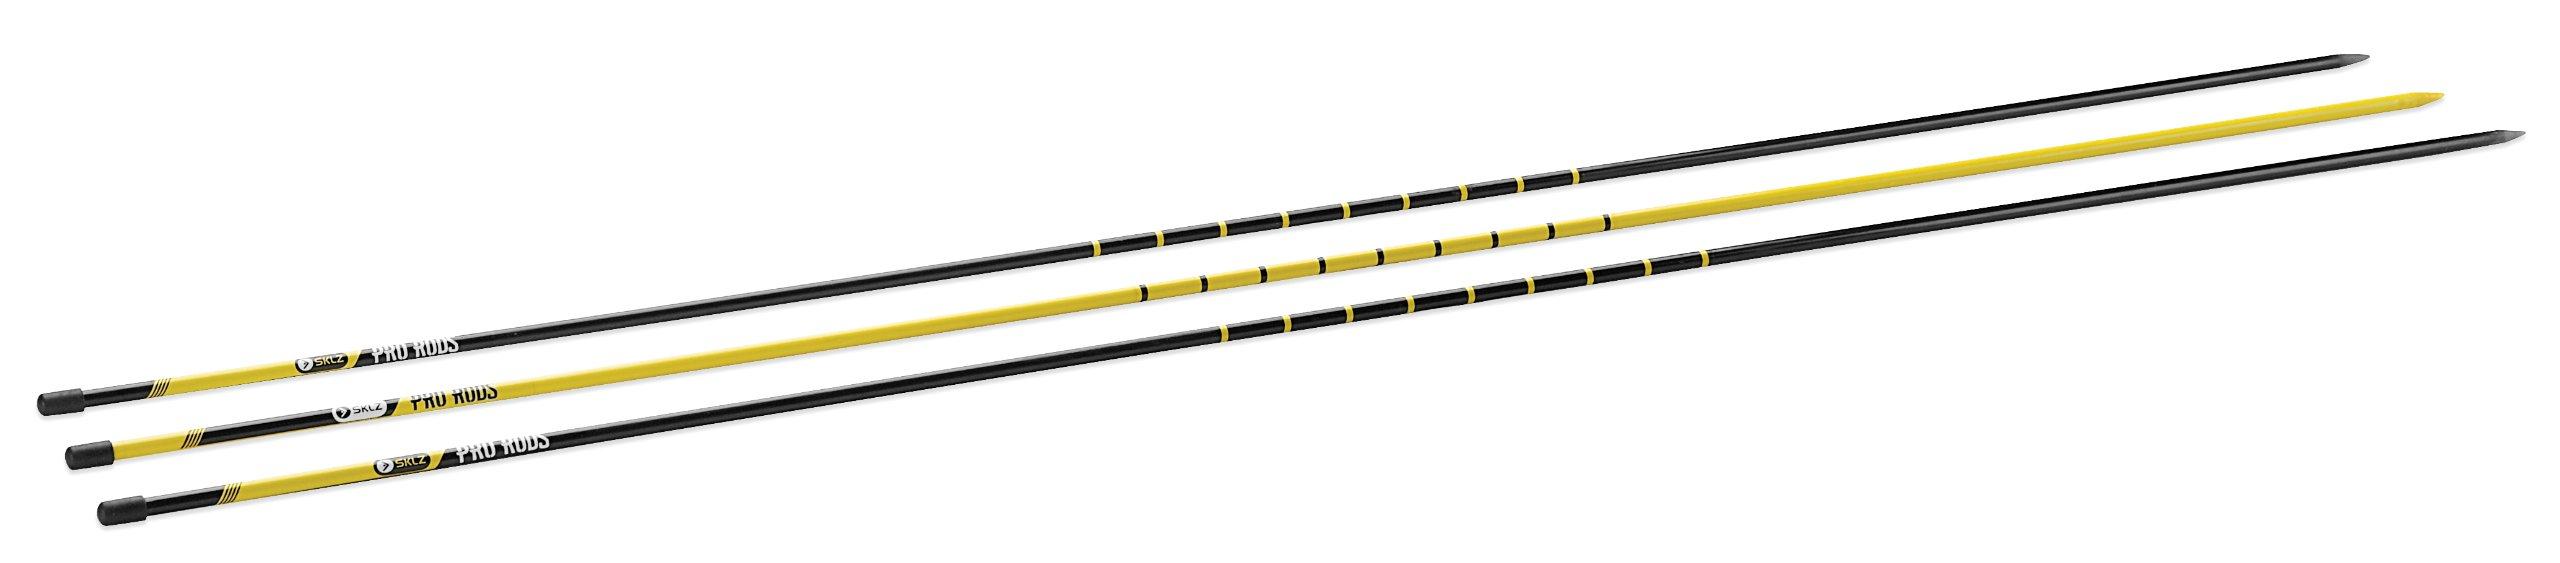 SKLZ Pro Rods Golf Trainer - 3-Rod Alignment Set